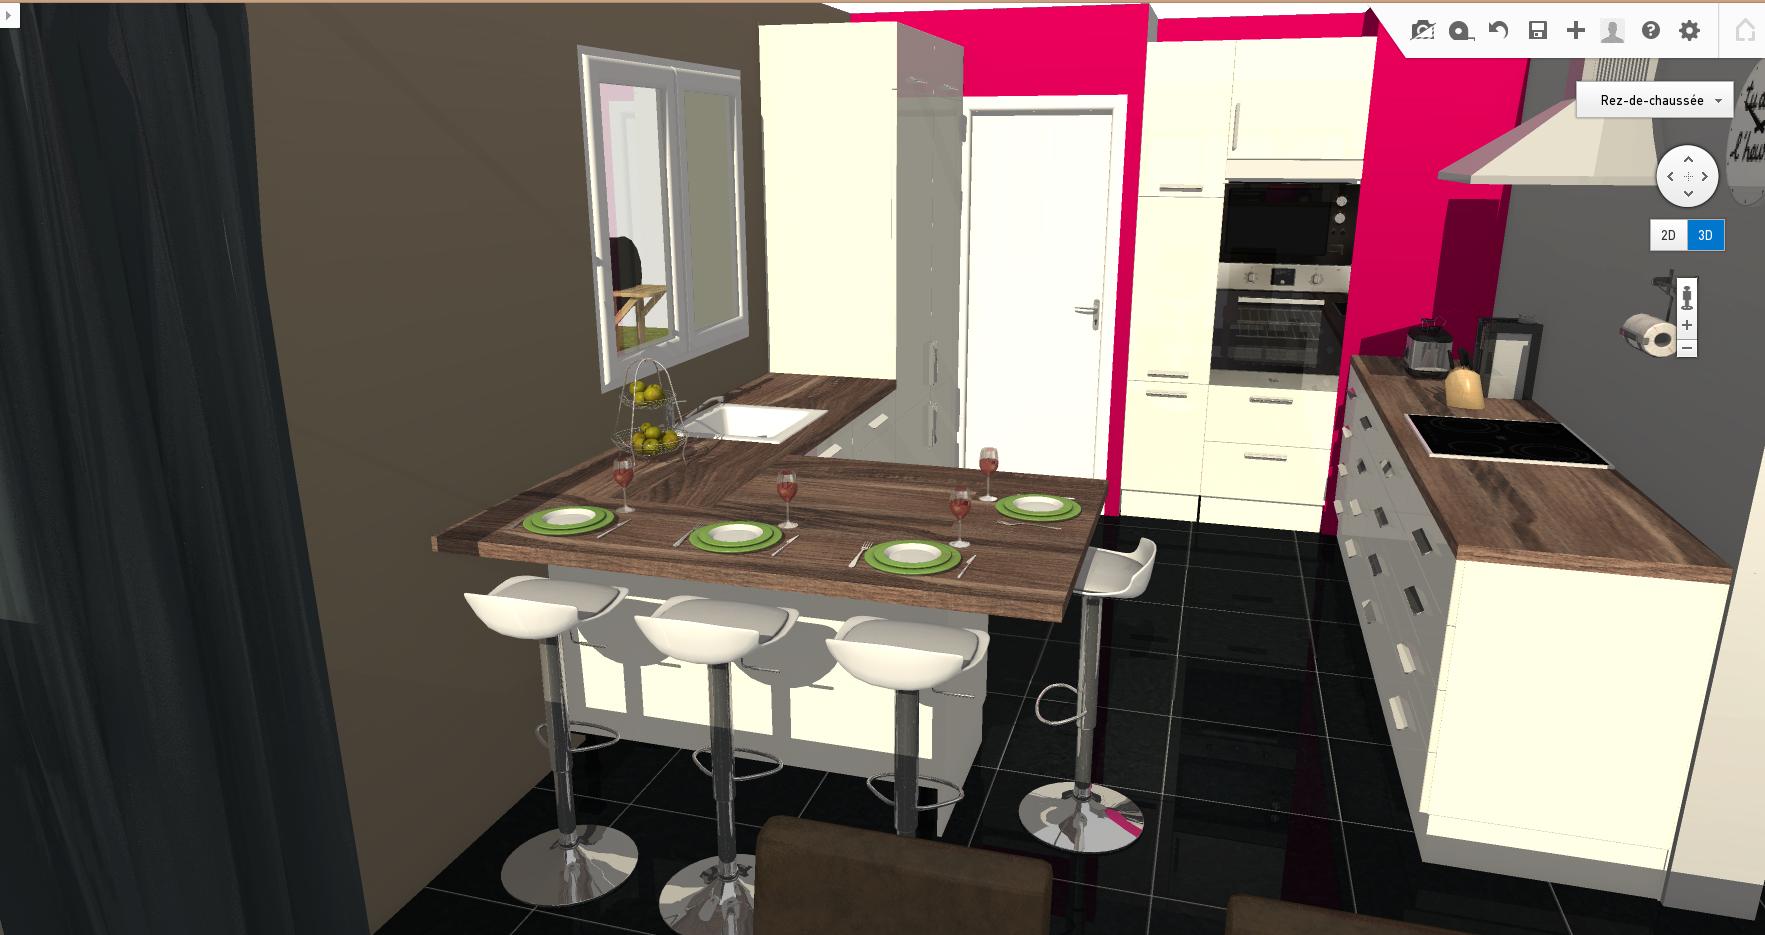 les projets implantation de vos cuisines 8903 messages page 486. Black Bedroom Furniture Sets. Home Design Ideas